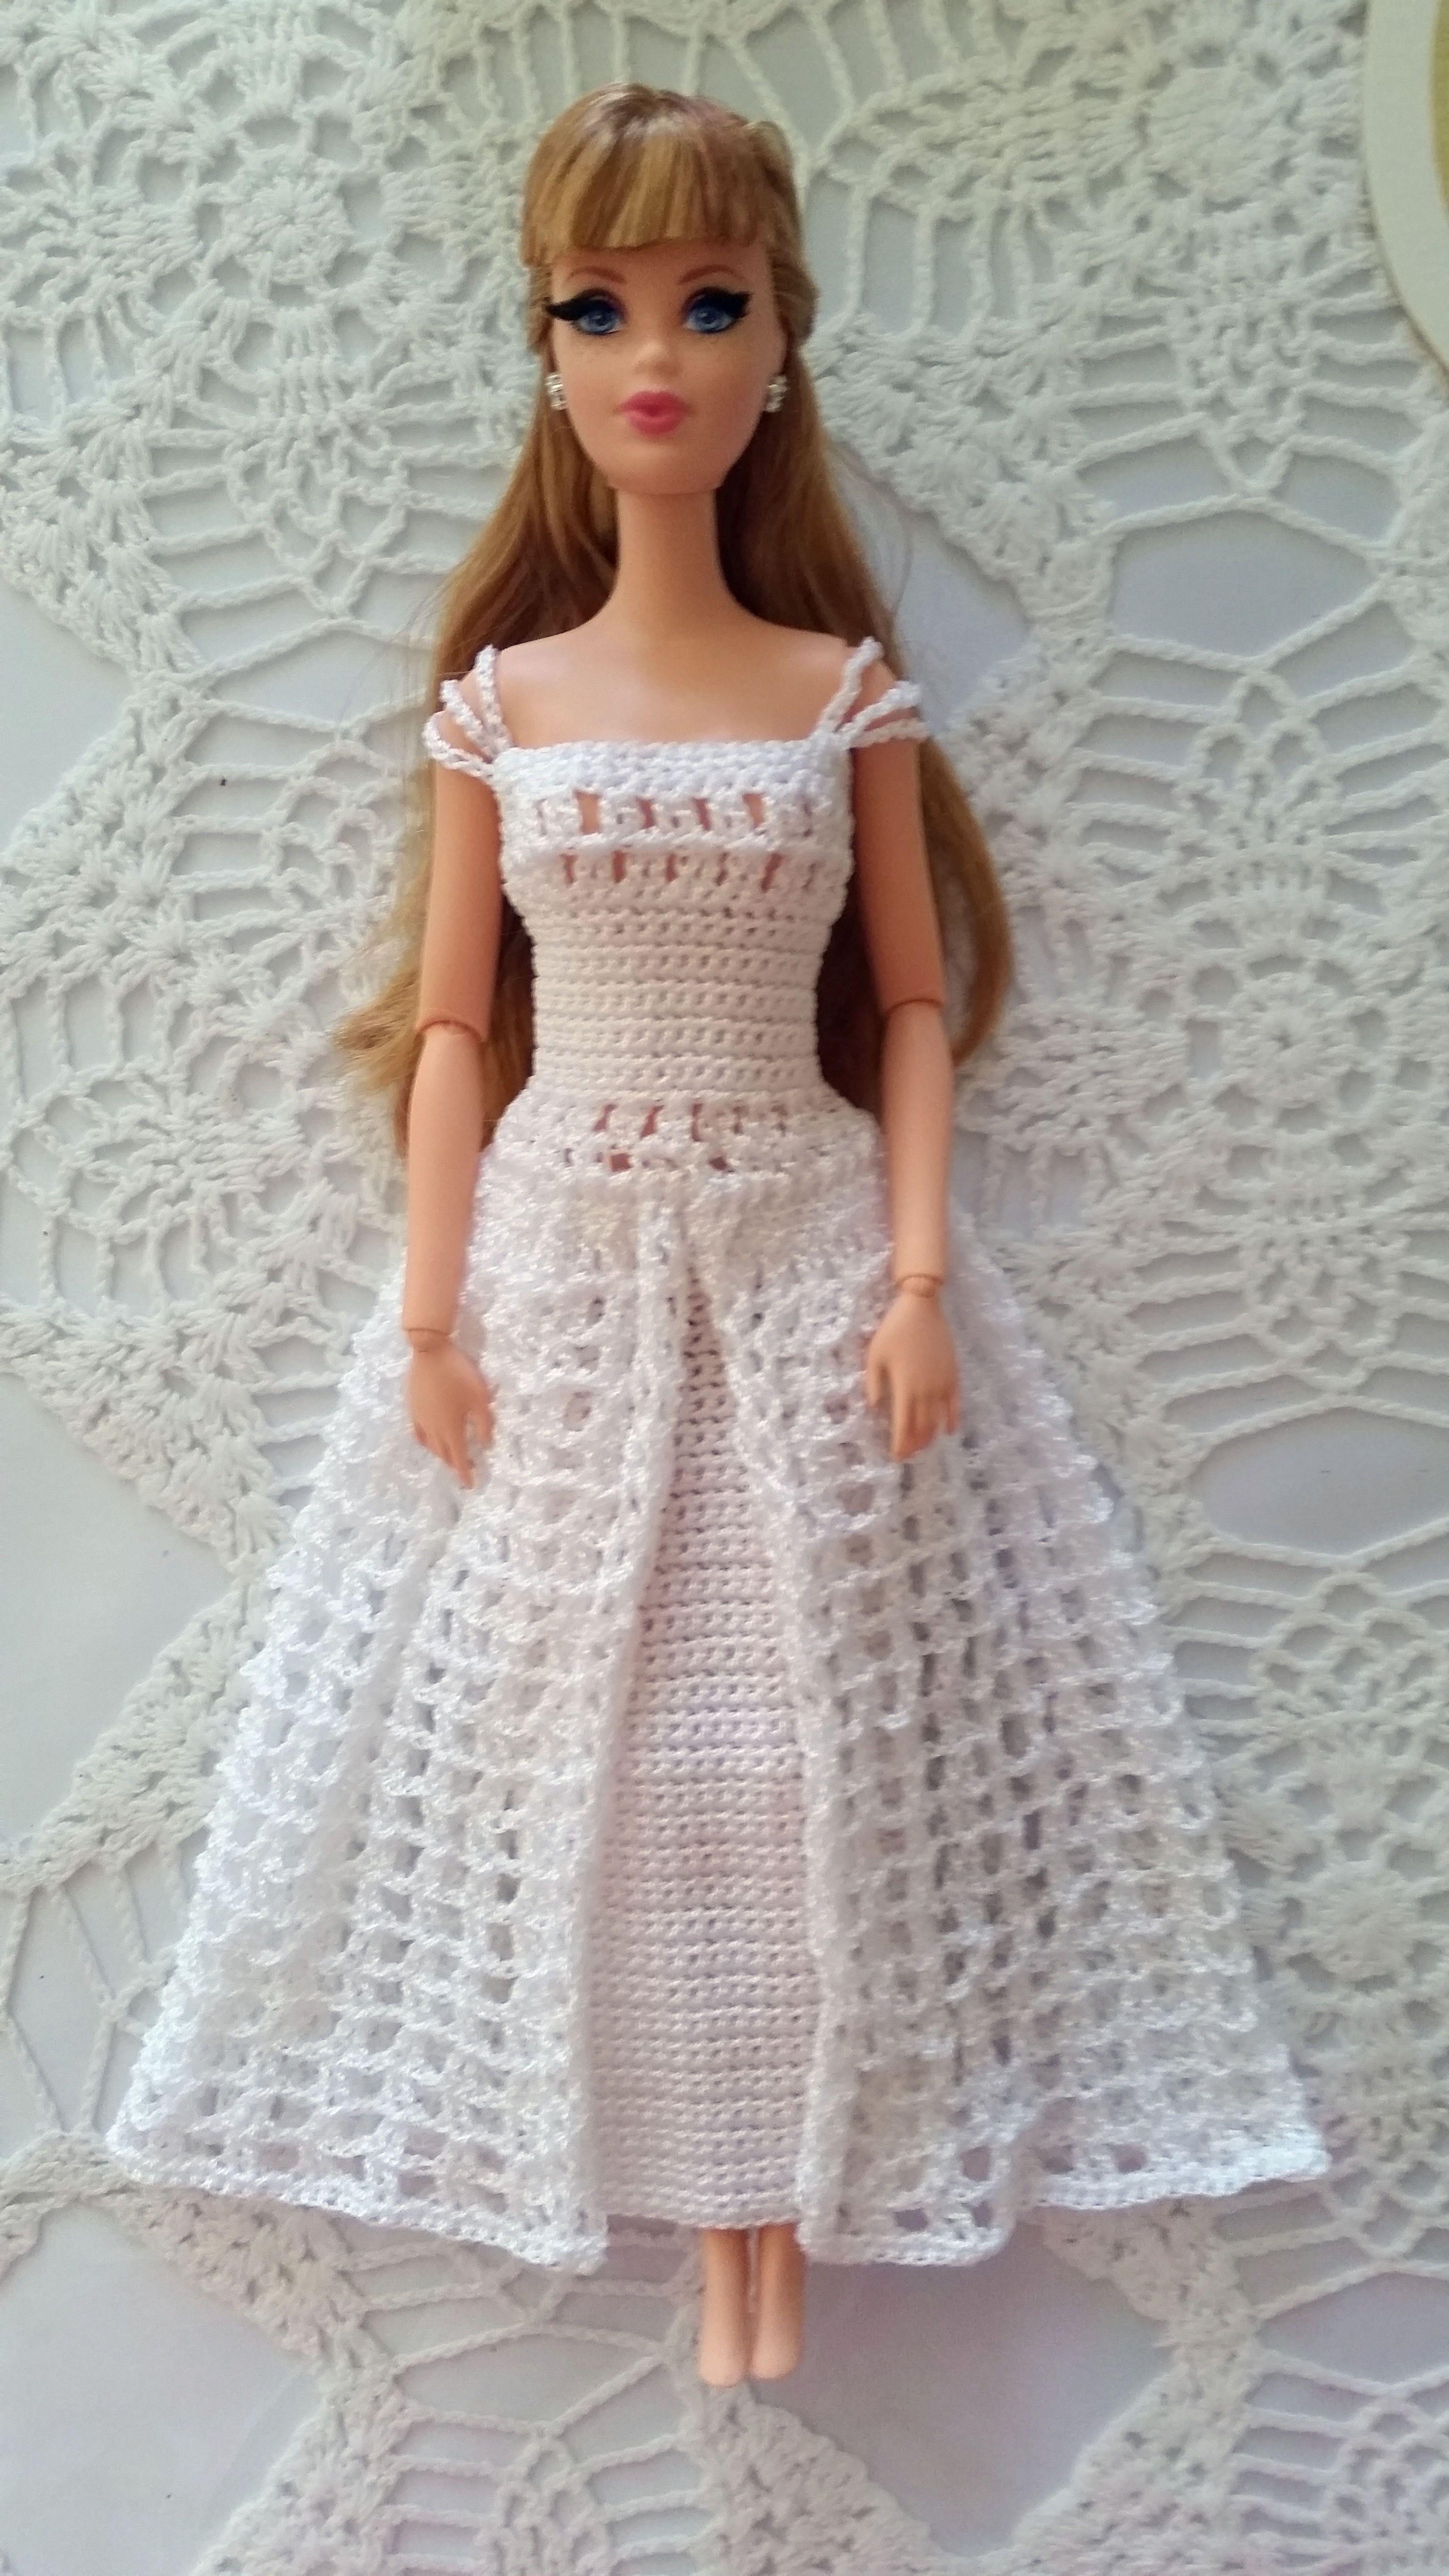 13587ab71d1a8a69da8f03886ee355ae.jpg (2988×5312) | Ropa de Barbie ...